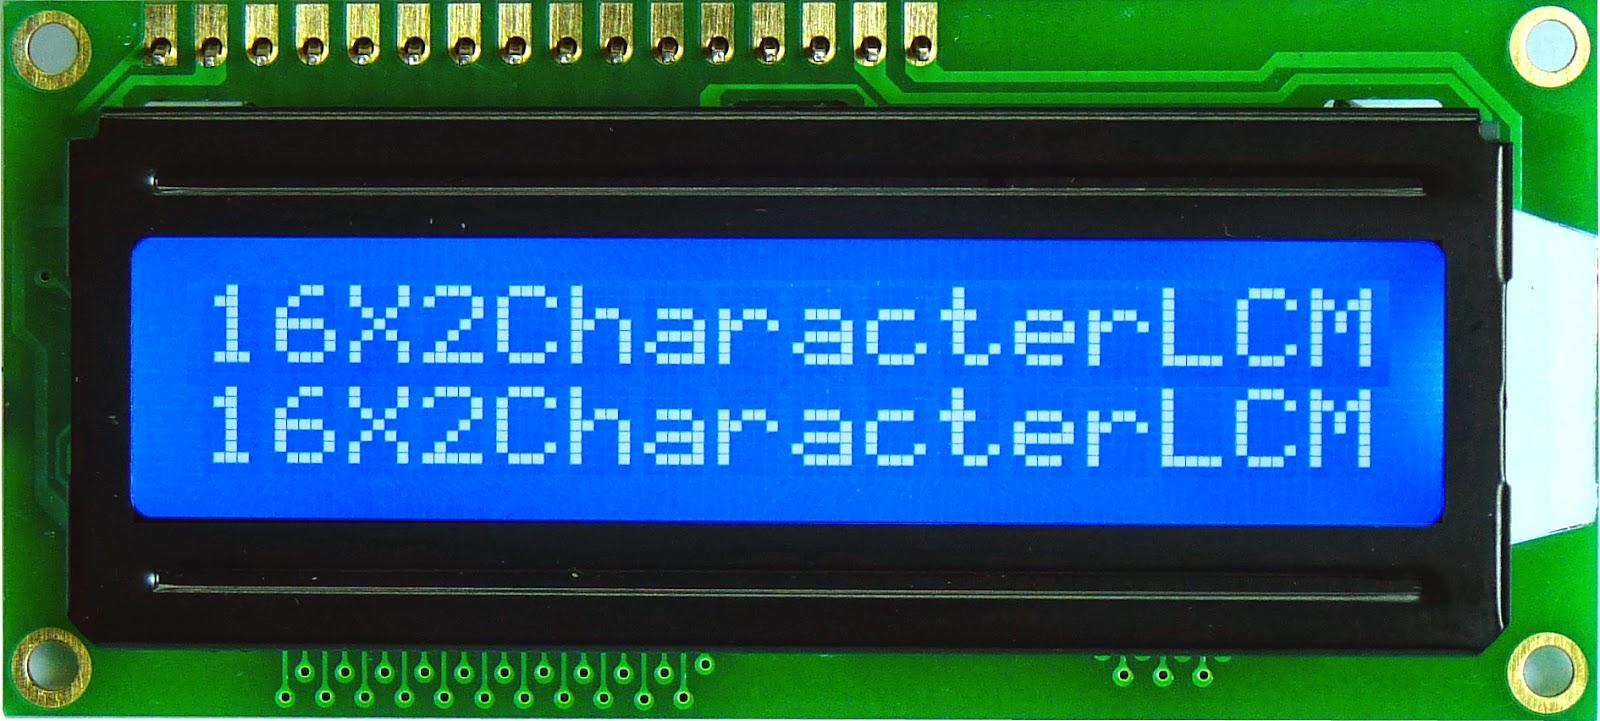 Running Text Di Lcd 16x2 Dengan Arduino Boarduino